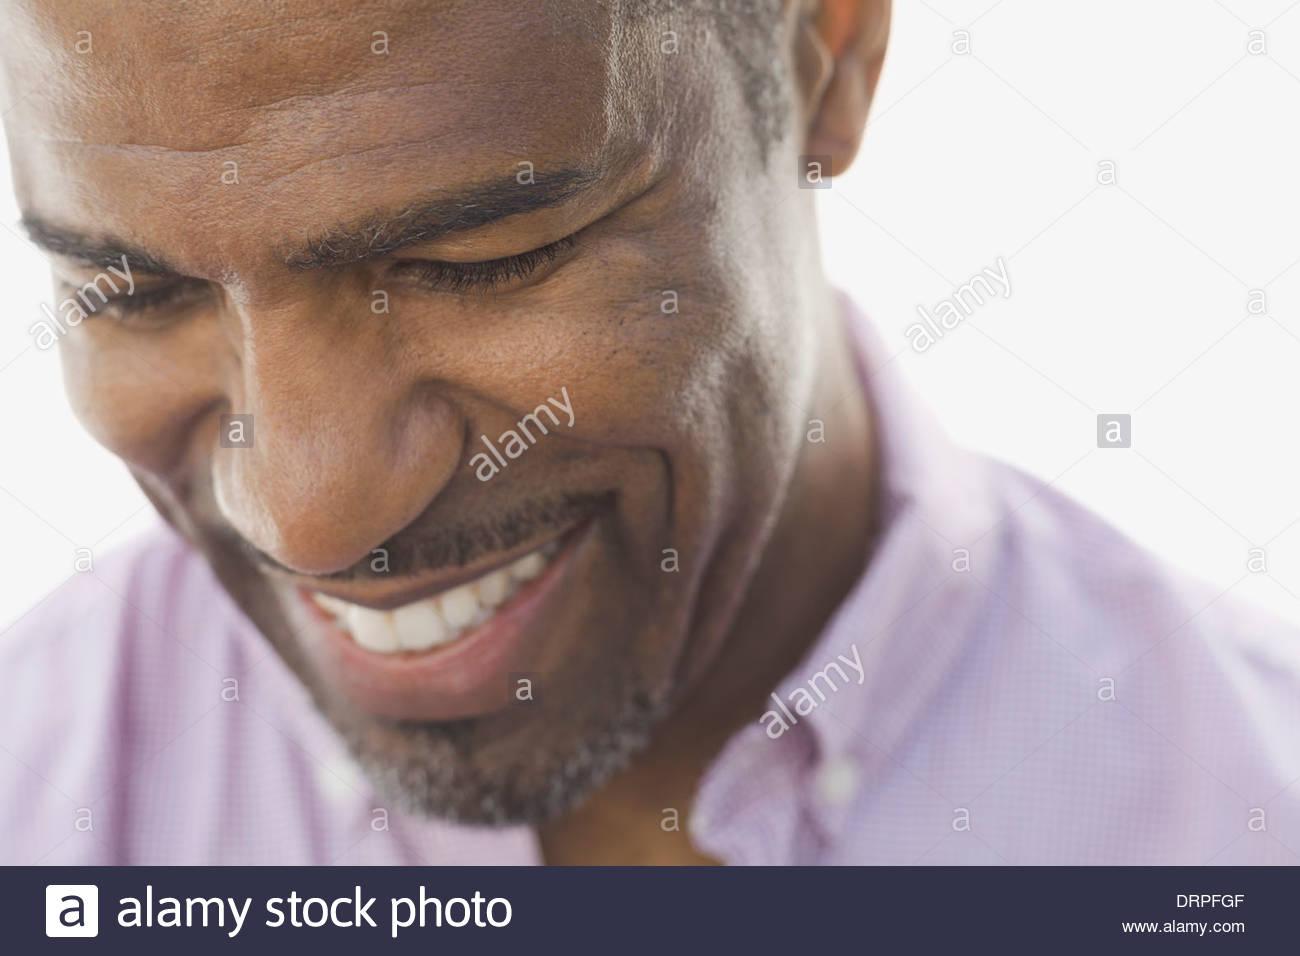 Close-up of smiling man - Stock Image